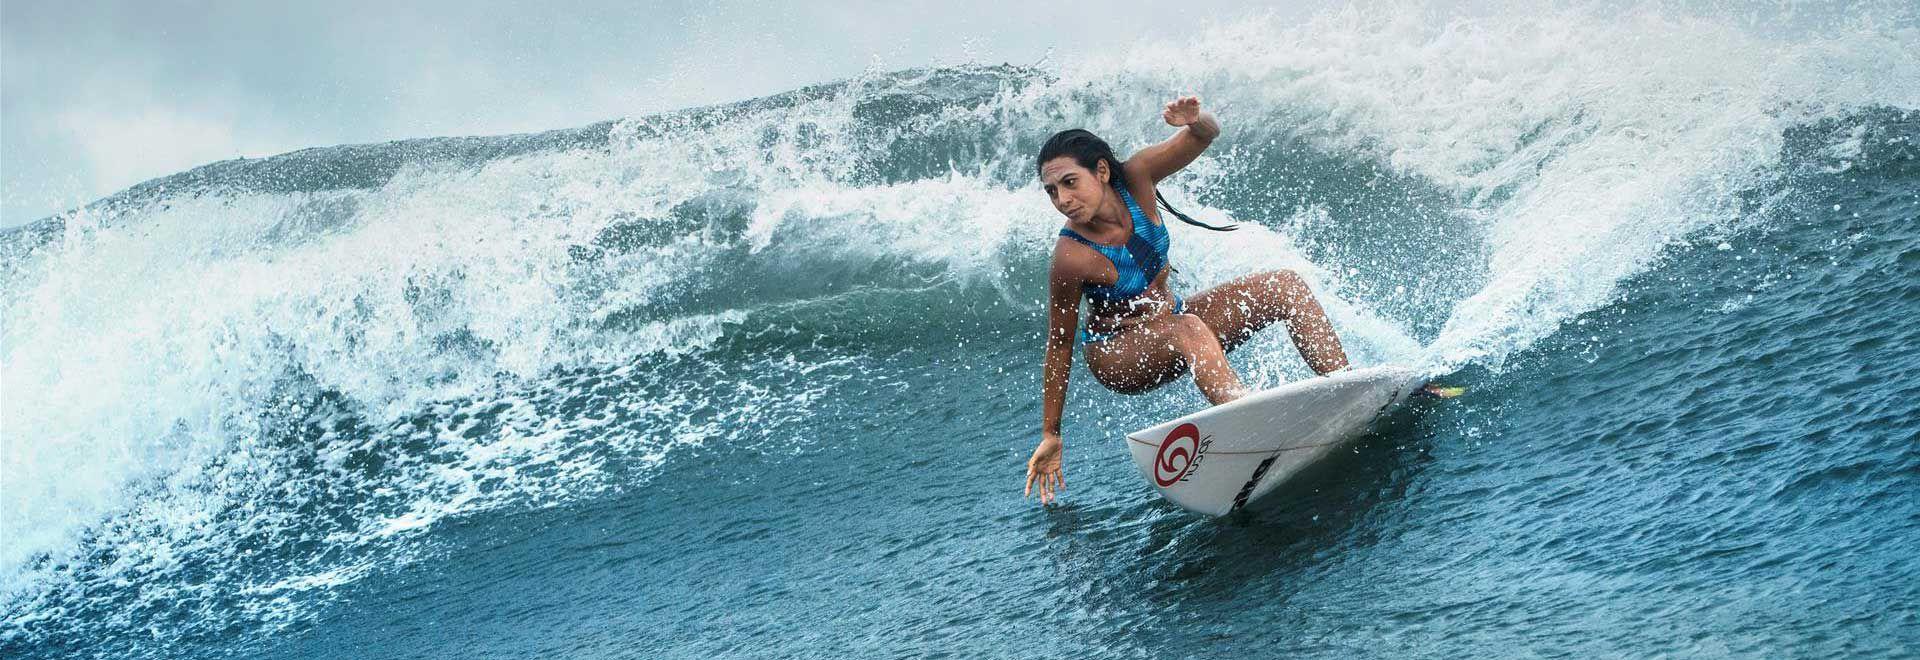 Curso de Iniciación de Surf<br />2 horas x 4 días